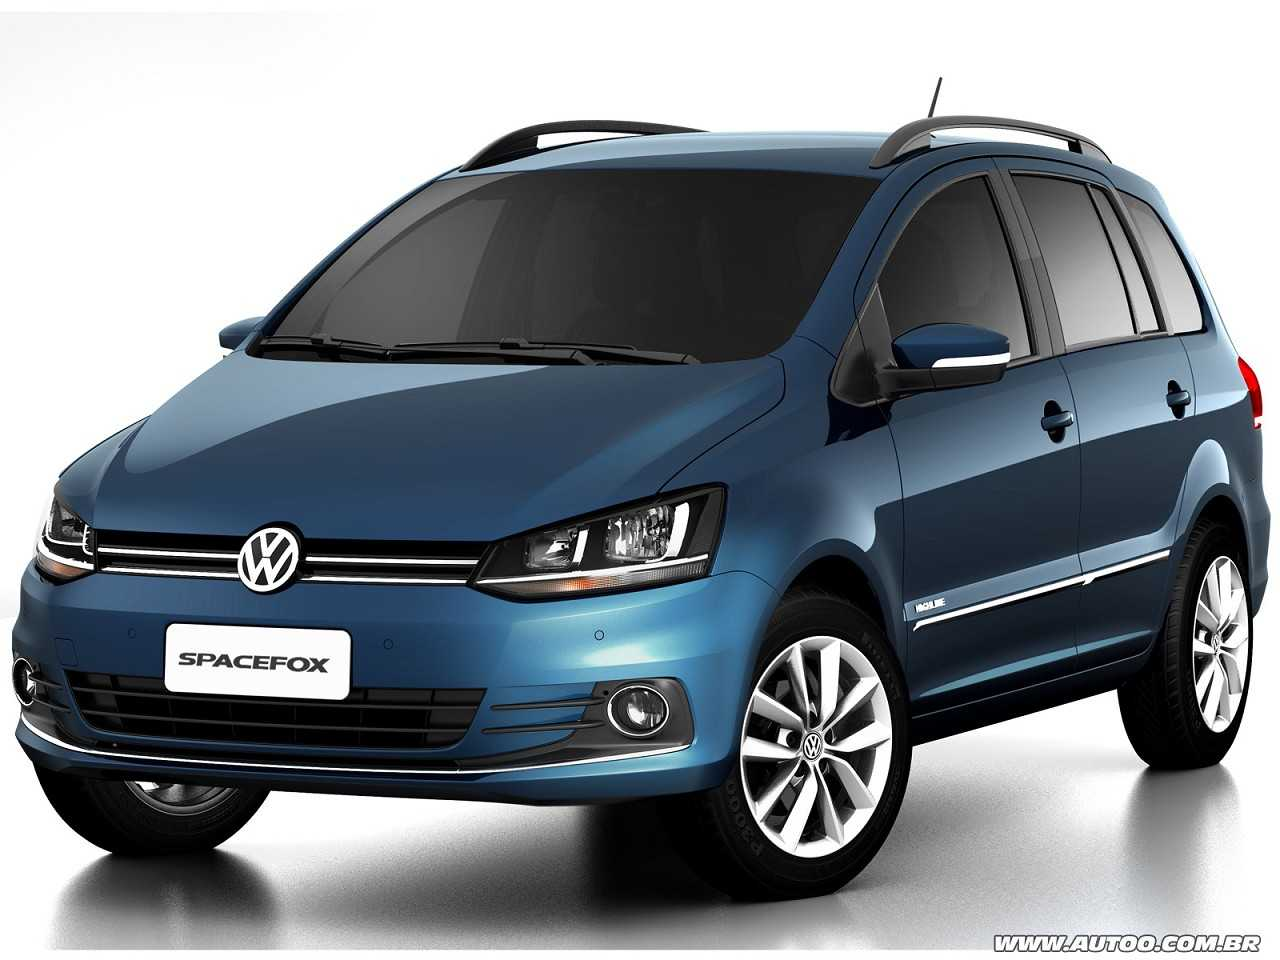 VolkswagenSpaceFox 2016 - ângulo frontal